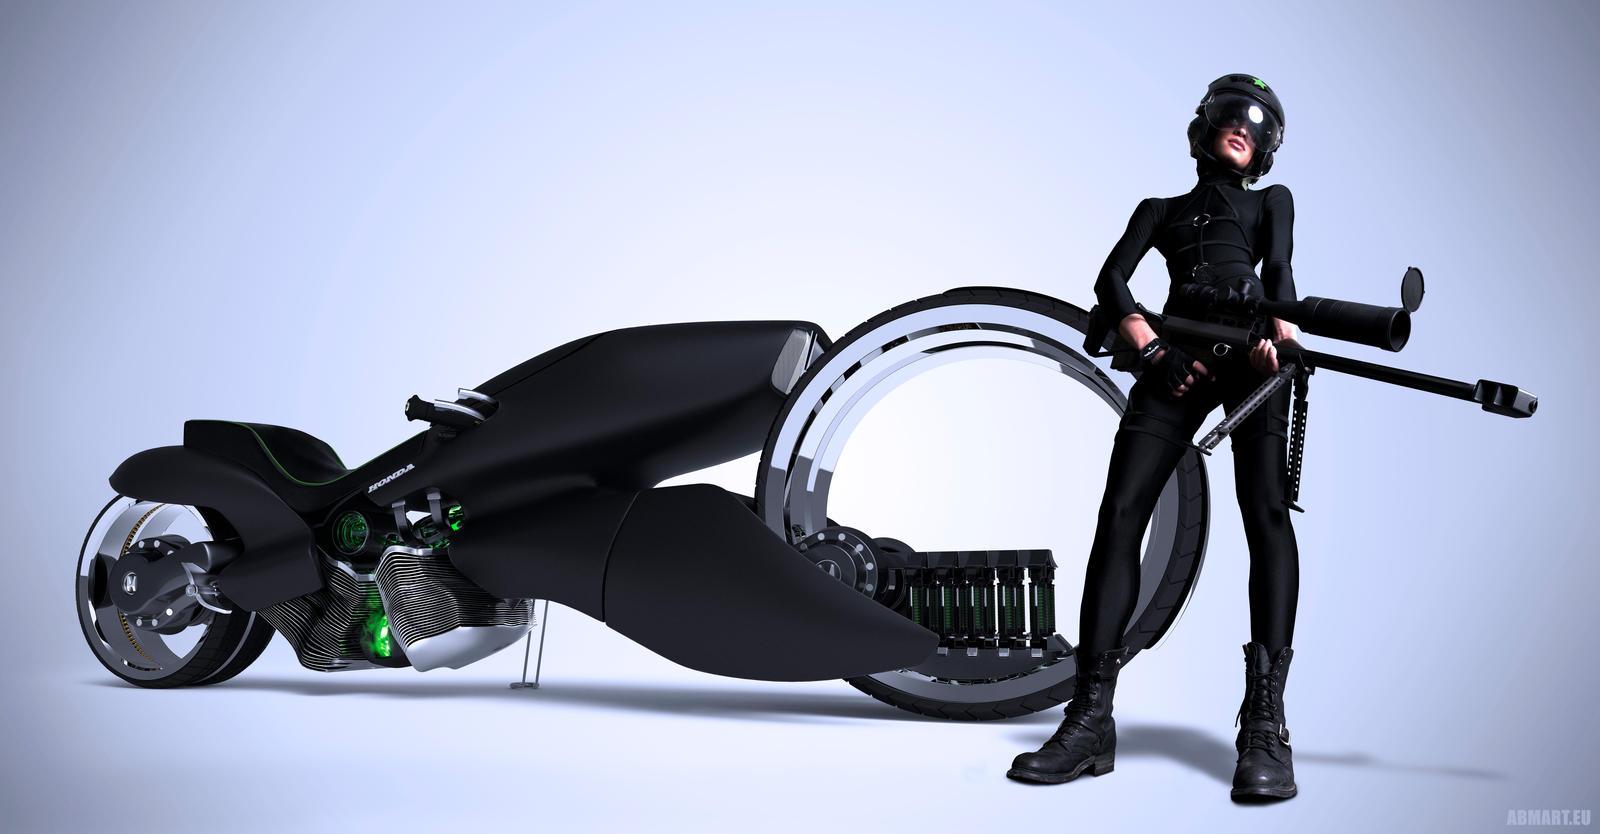 Honda motorbike 2029 by abmart